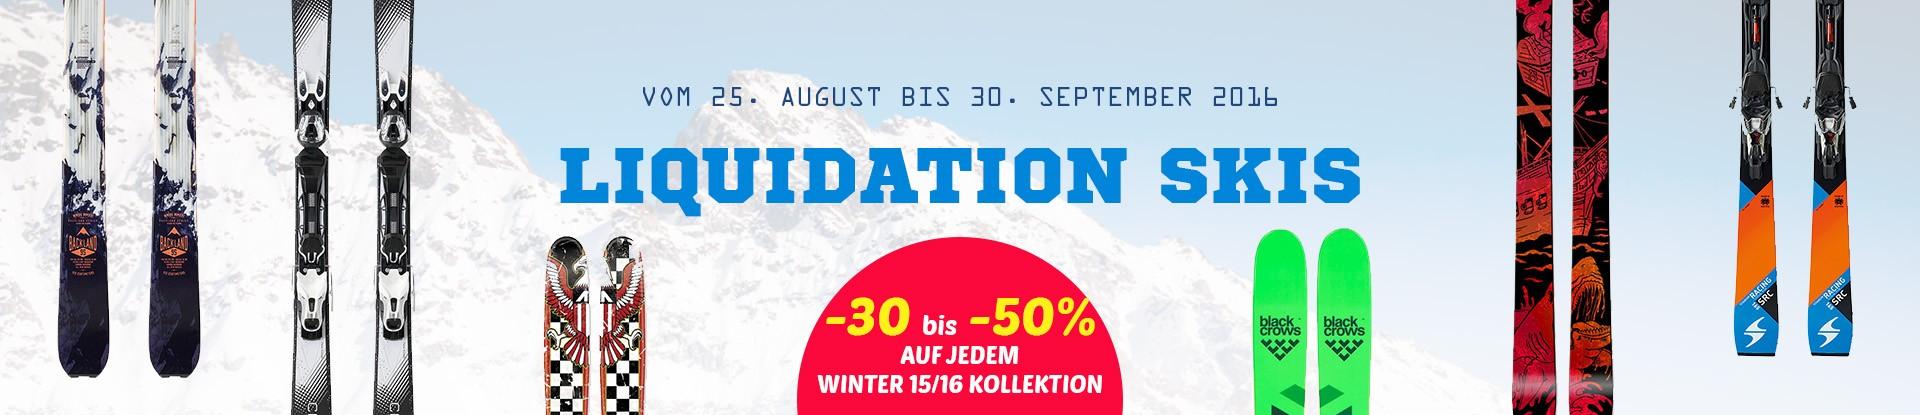 liquidation skis